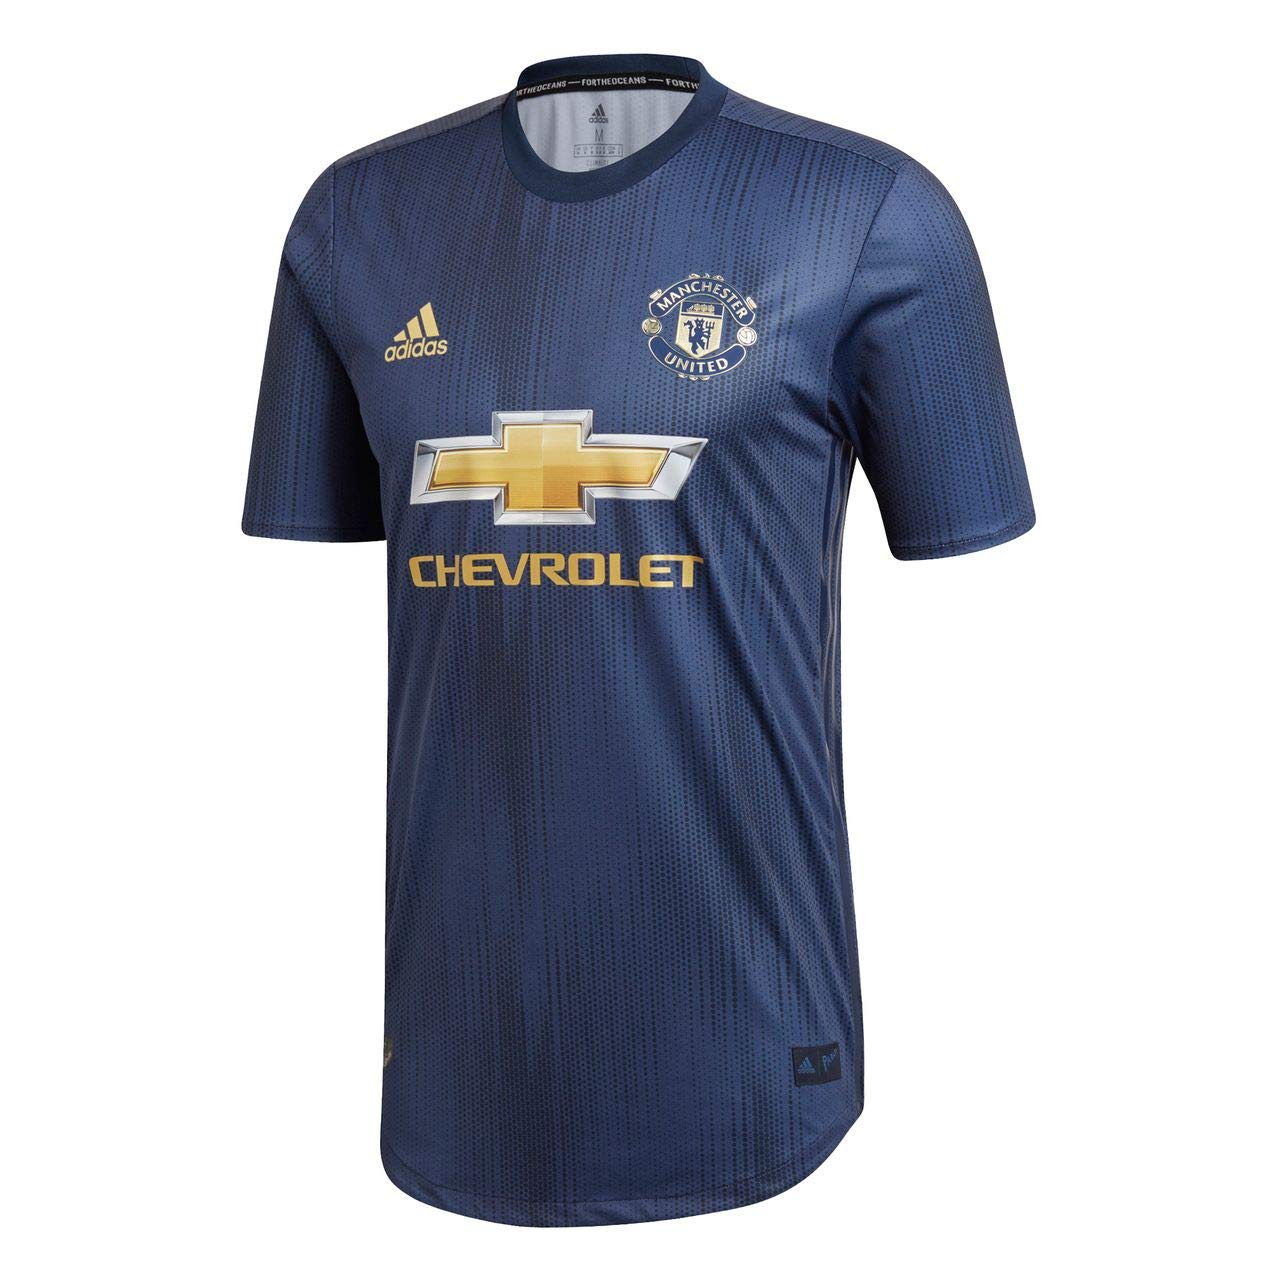 Adidas Damen 18 19 Manchester United 3rd Trikot